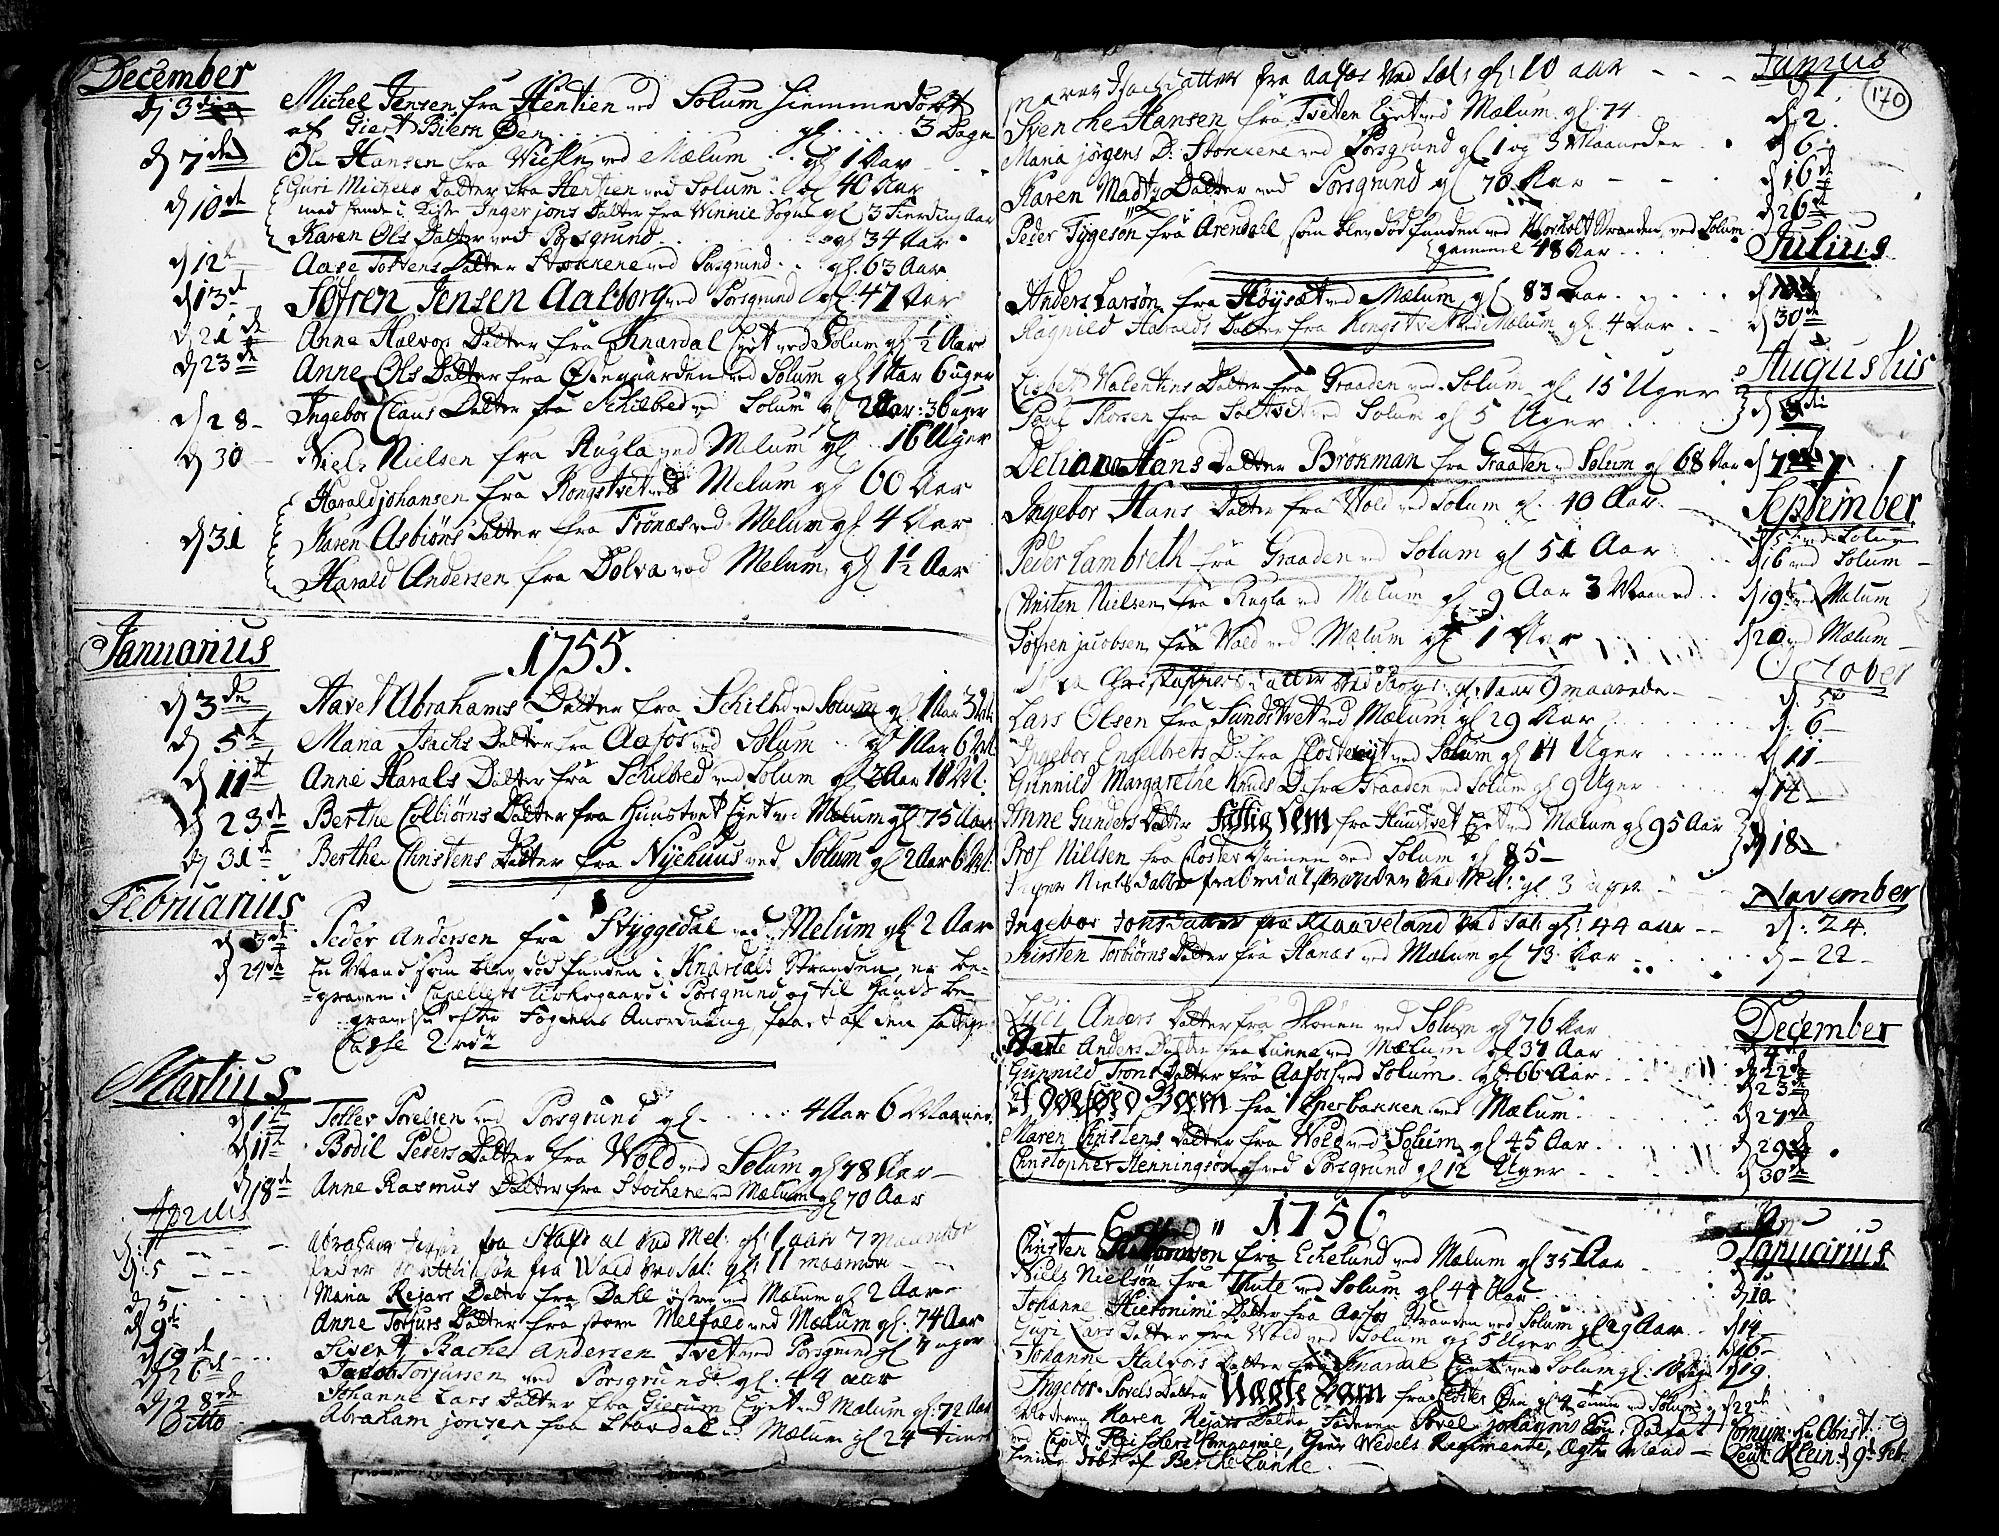 SAKO, Solum kirkebøker, F/Fa/L0002: Ministerialbok nr. I 2, 1713-1761, s. 170